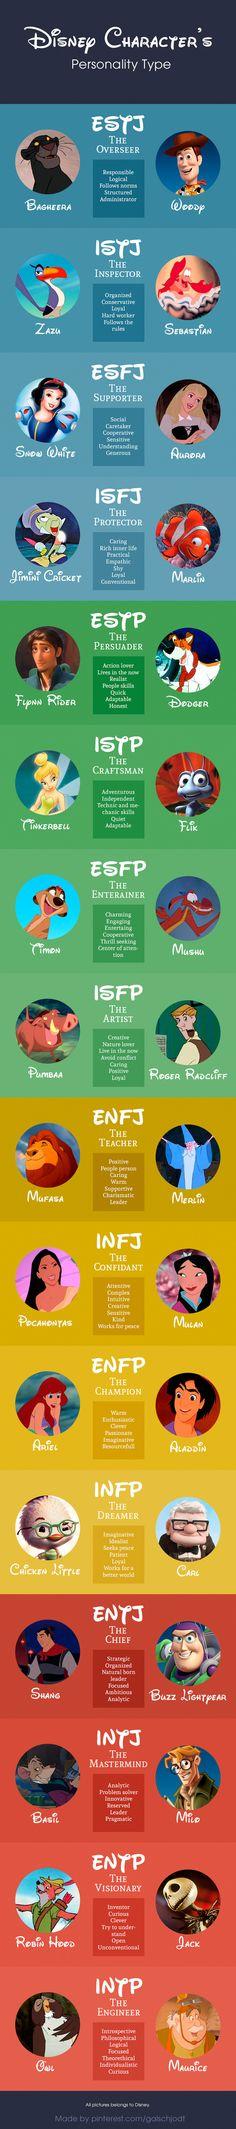 Disney Personality Type ENFJ TEACHER ENFP The Champion